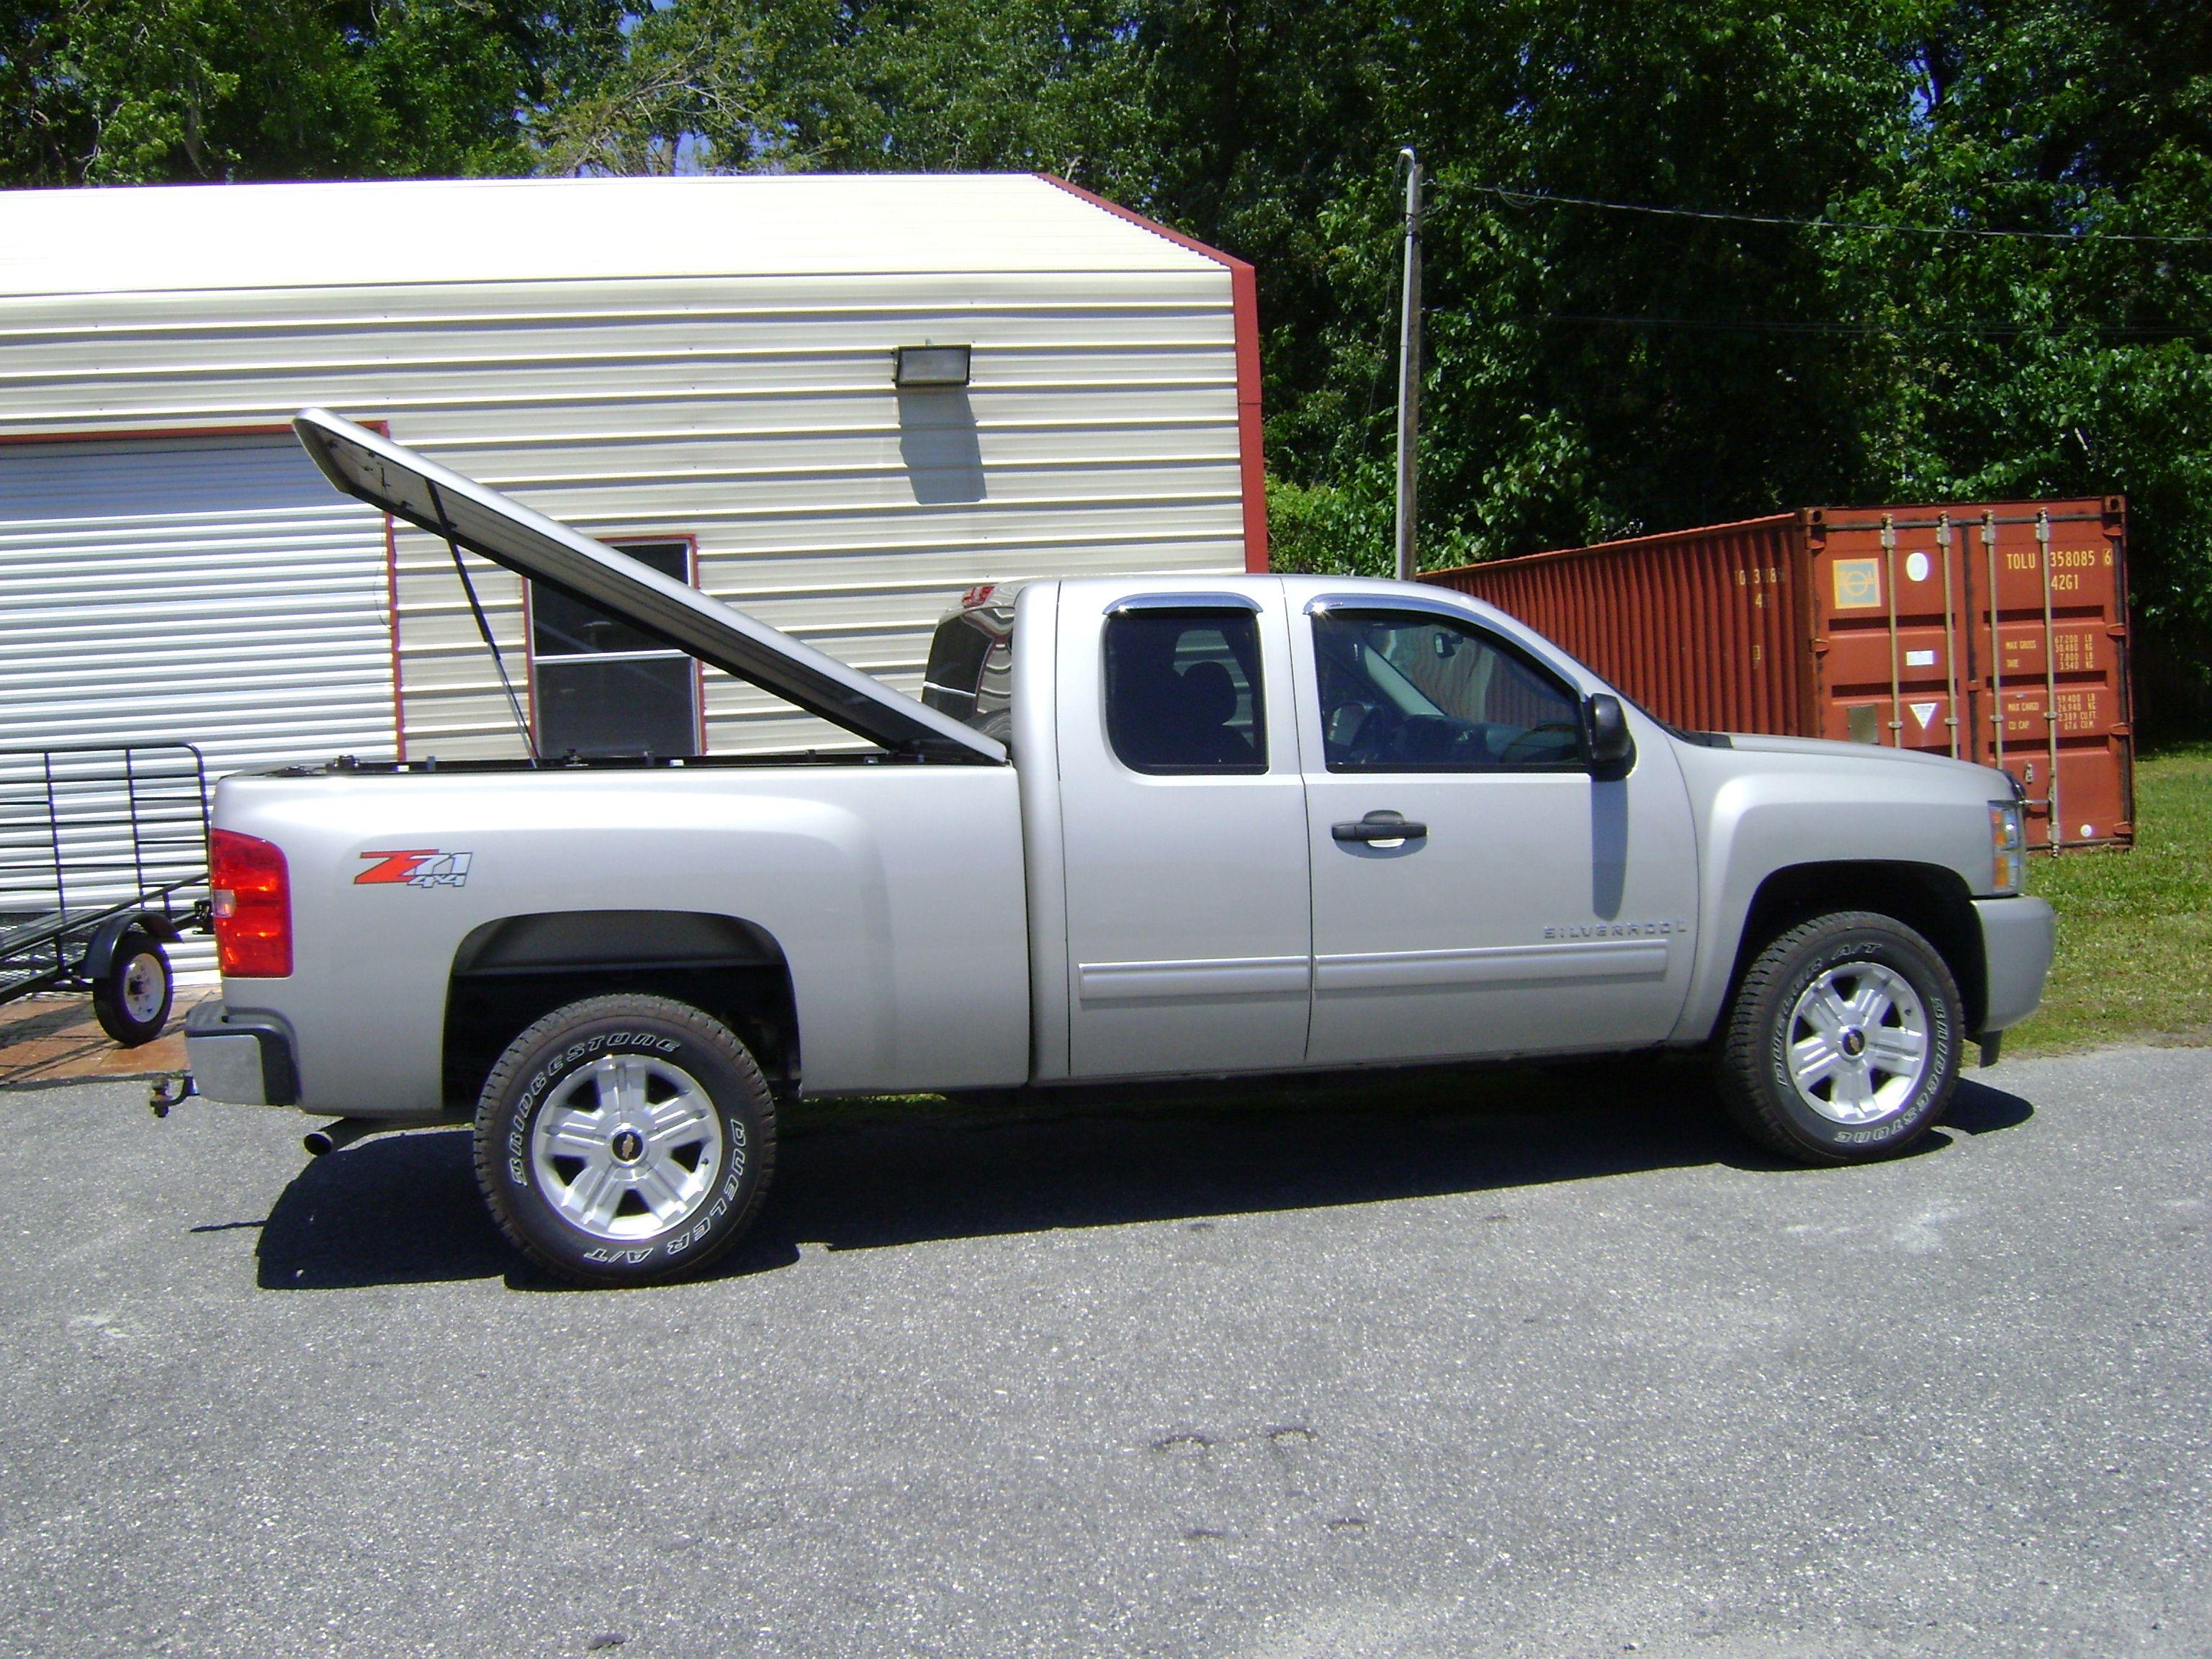 Truck cap professionally installed on Chevy Silverado